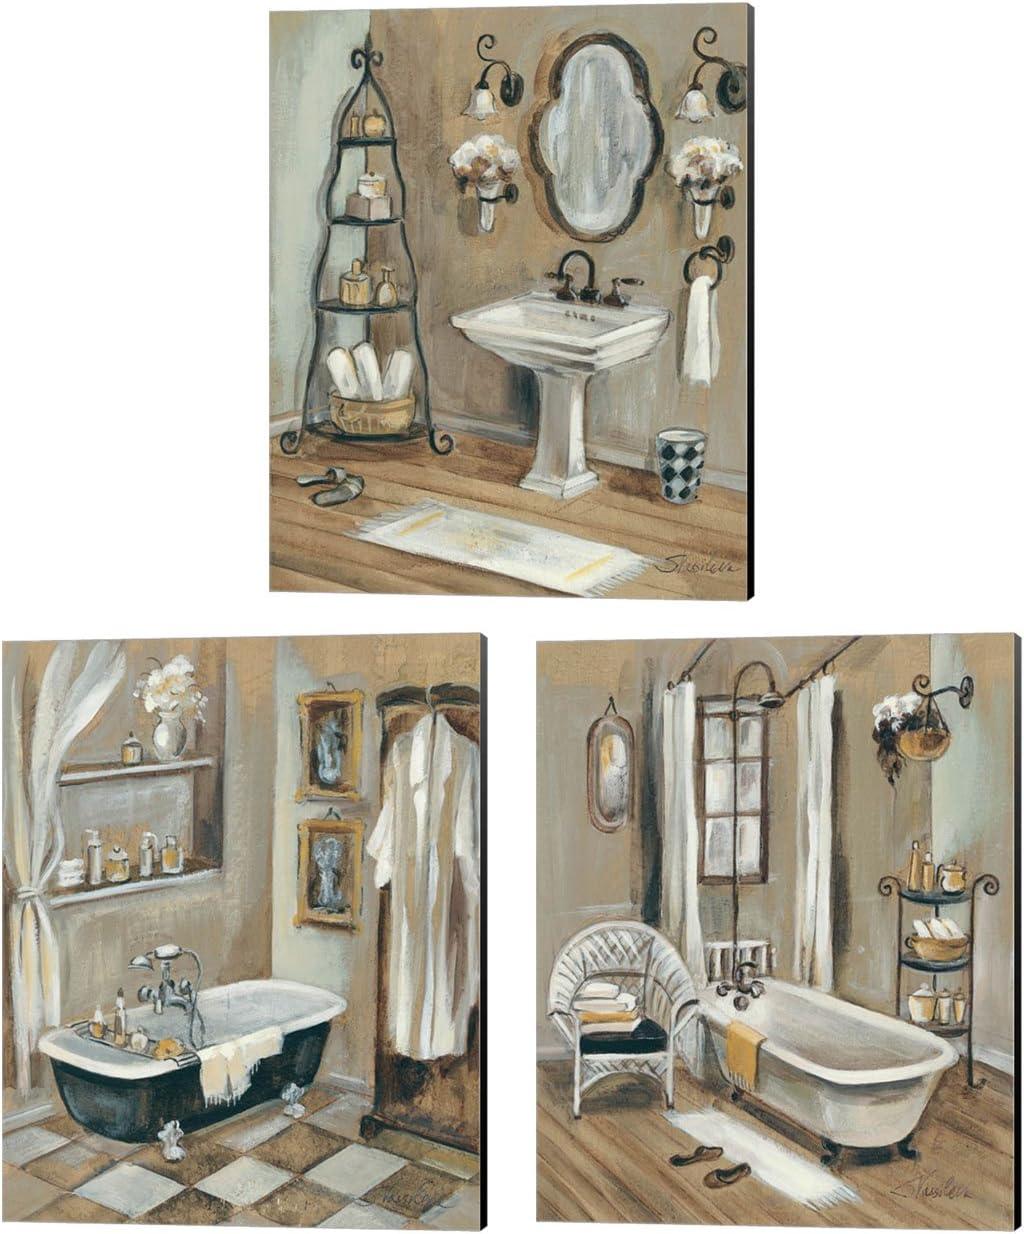 Amazon Com French Bath By Silvia Vassileva 3 Piece Canvas Art Set 12 X 15 Inches Each French Bathroom Art Posters Prints